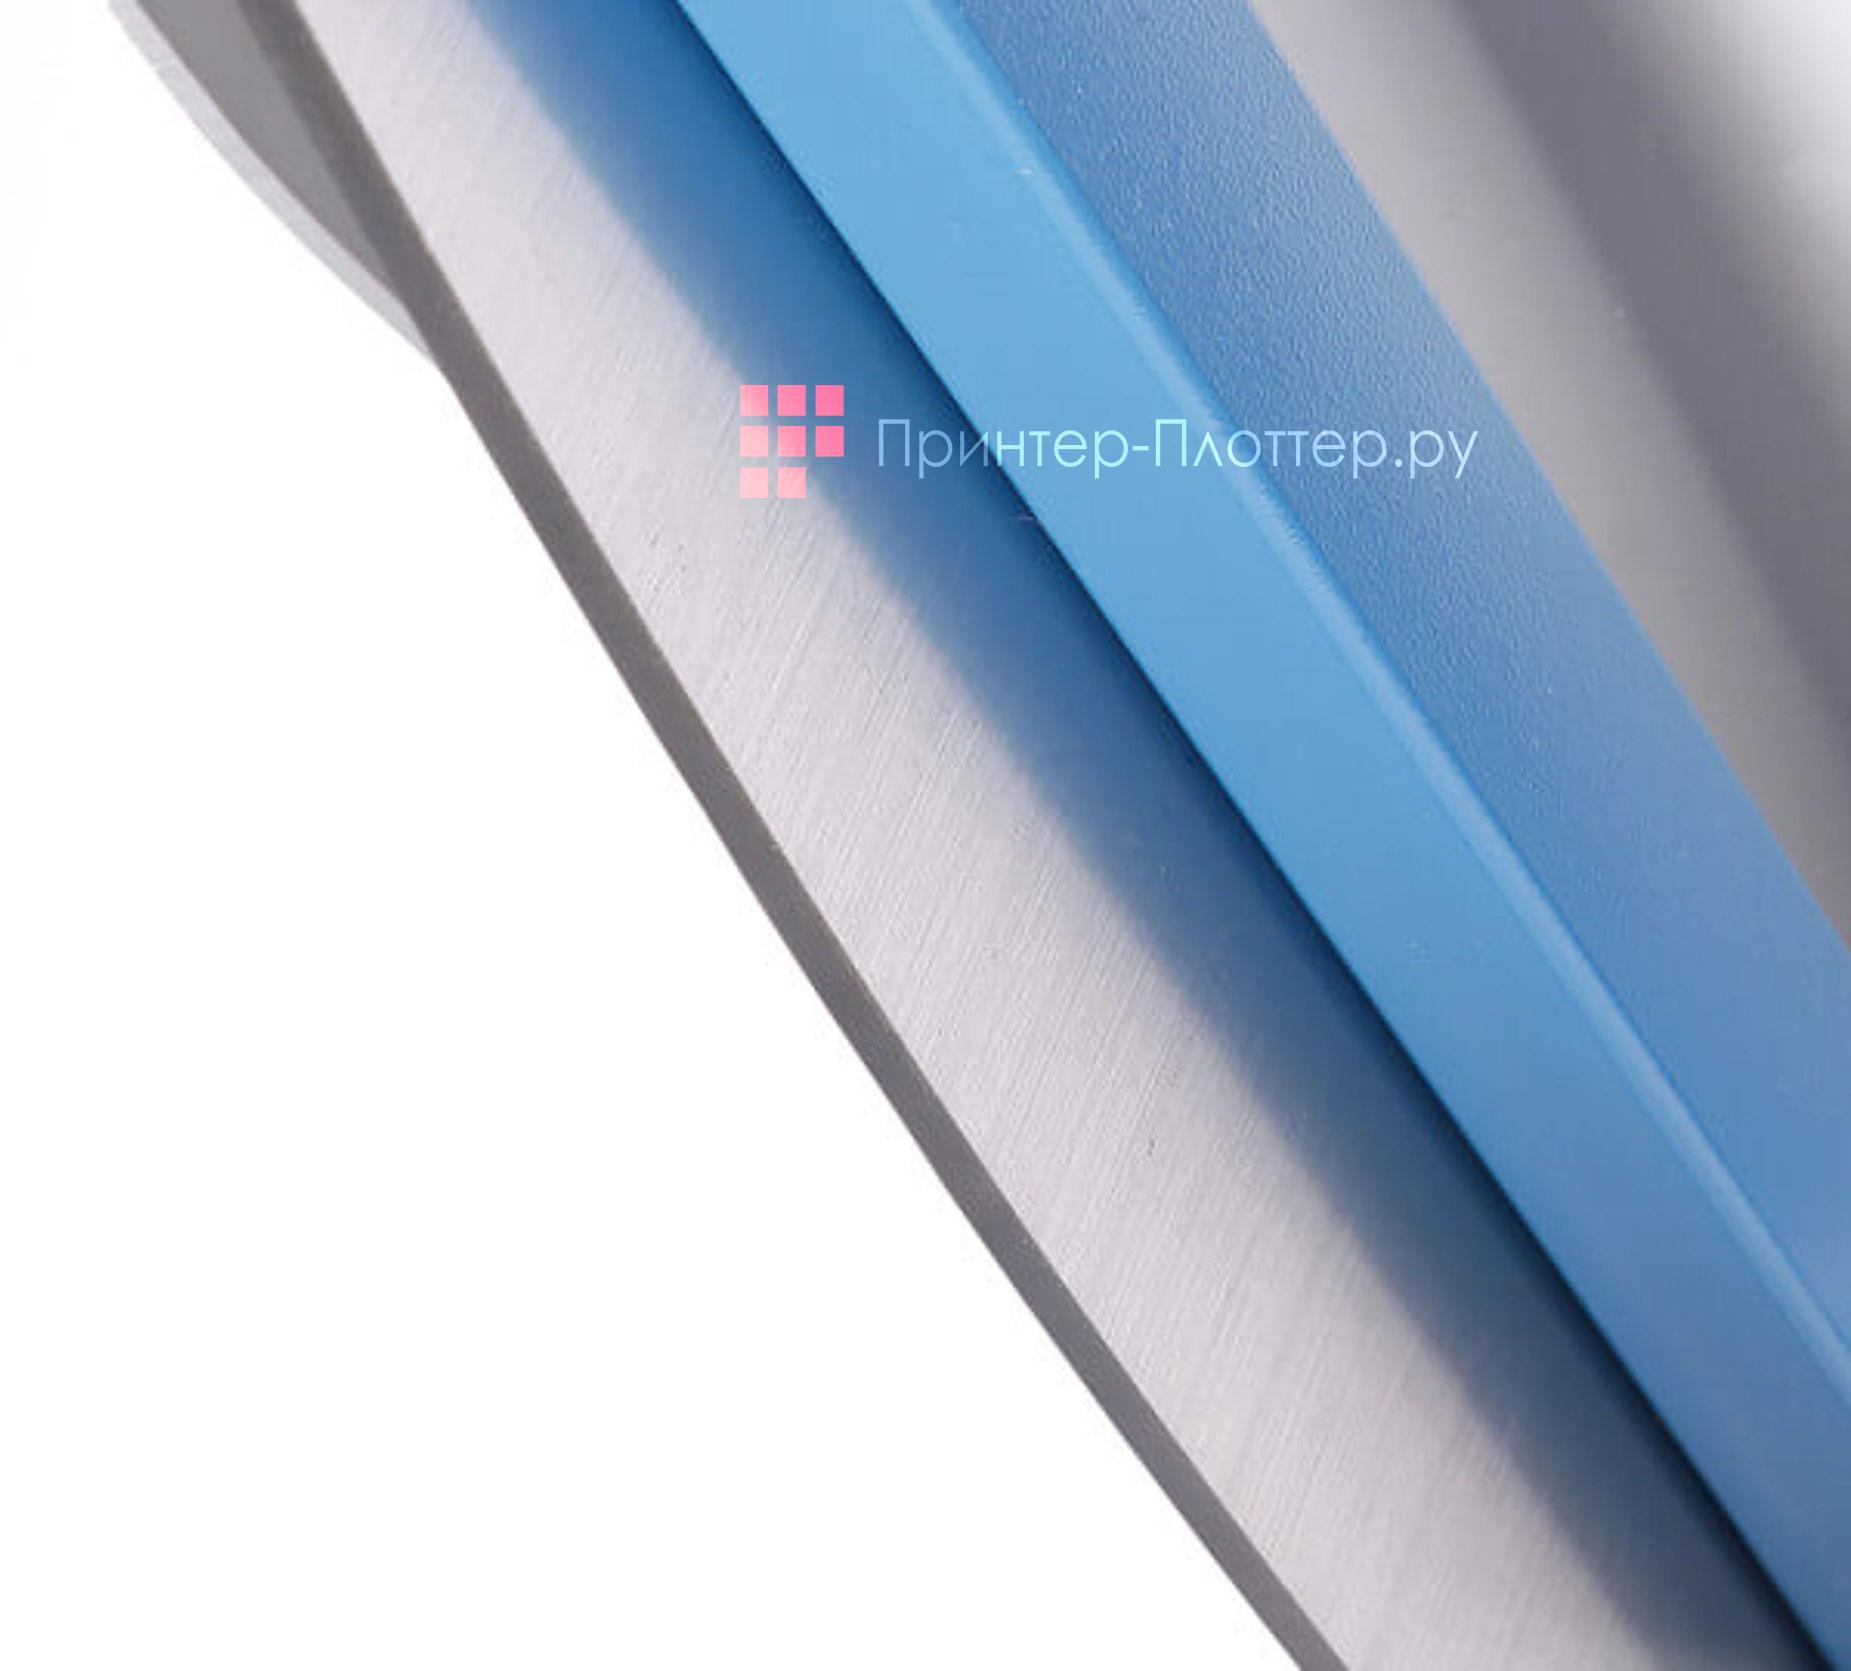 Dahle 569. Нож для материалов